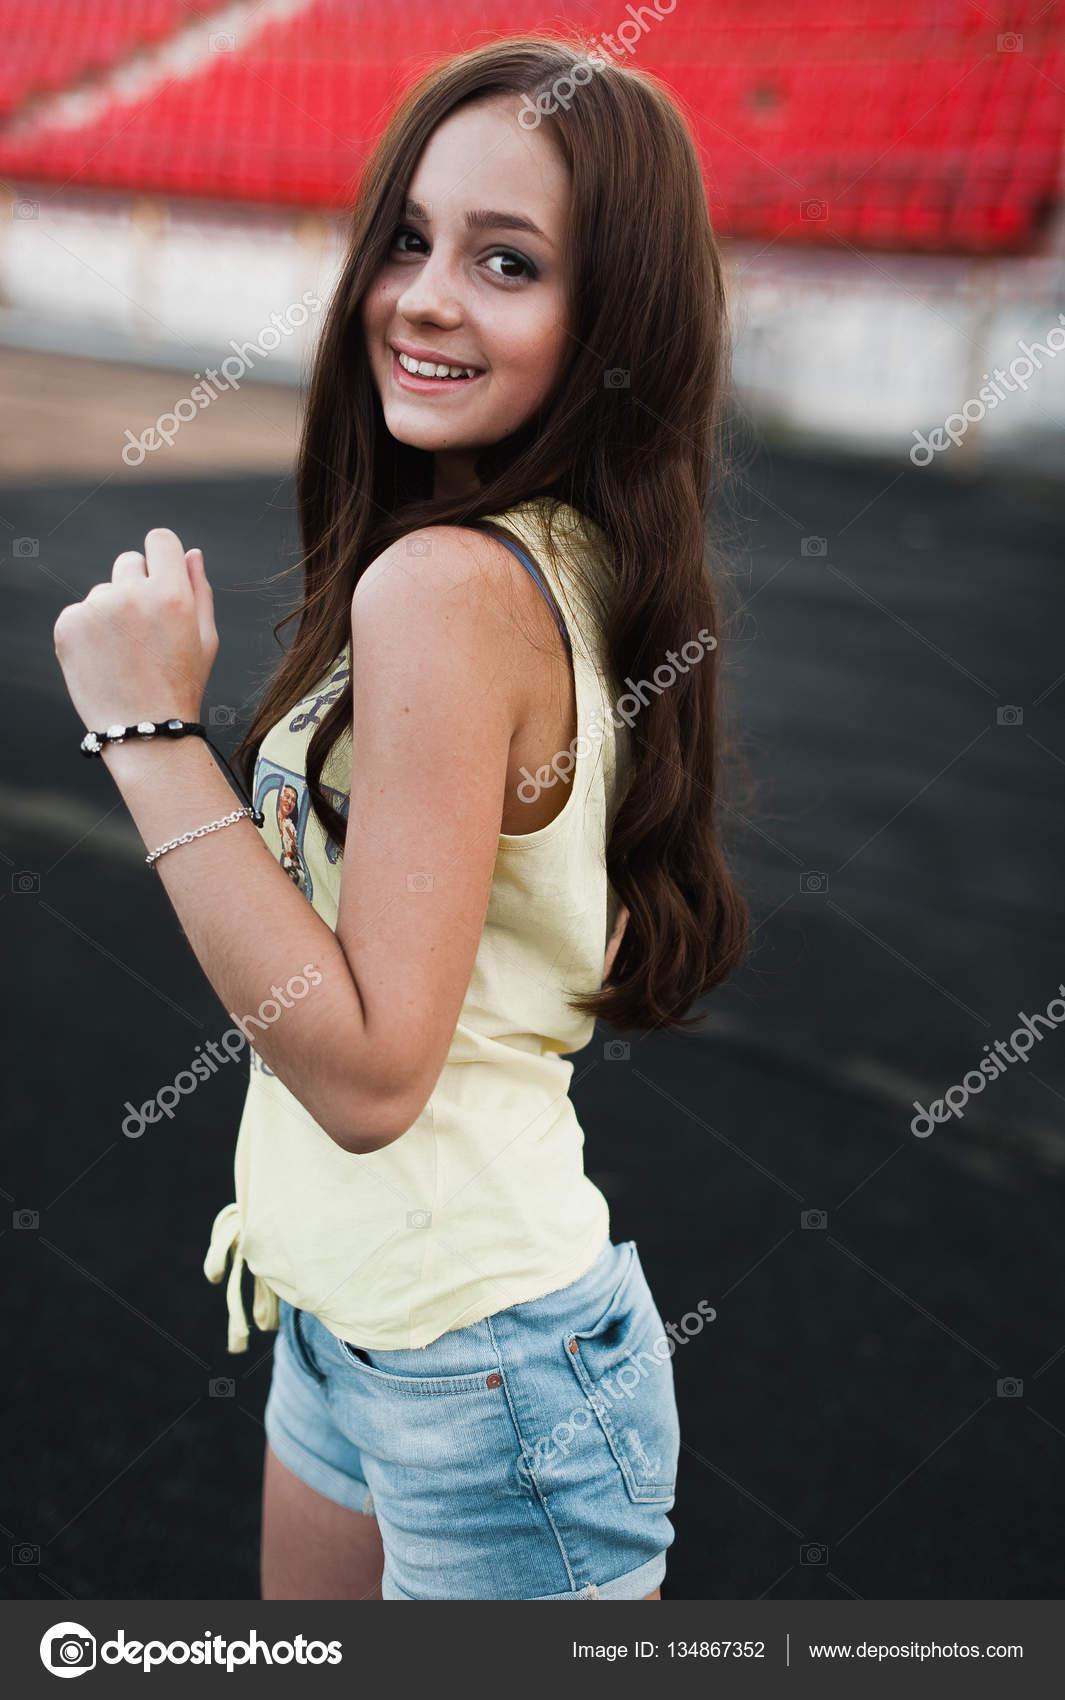 Girl Having Fun Outdoor Pretty Girl Sitting At School Stadium